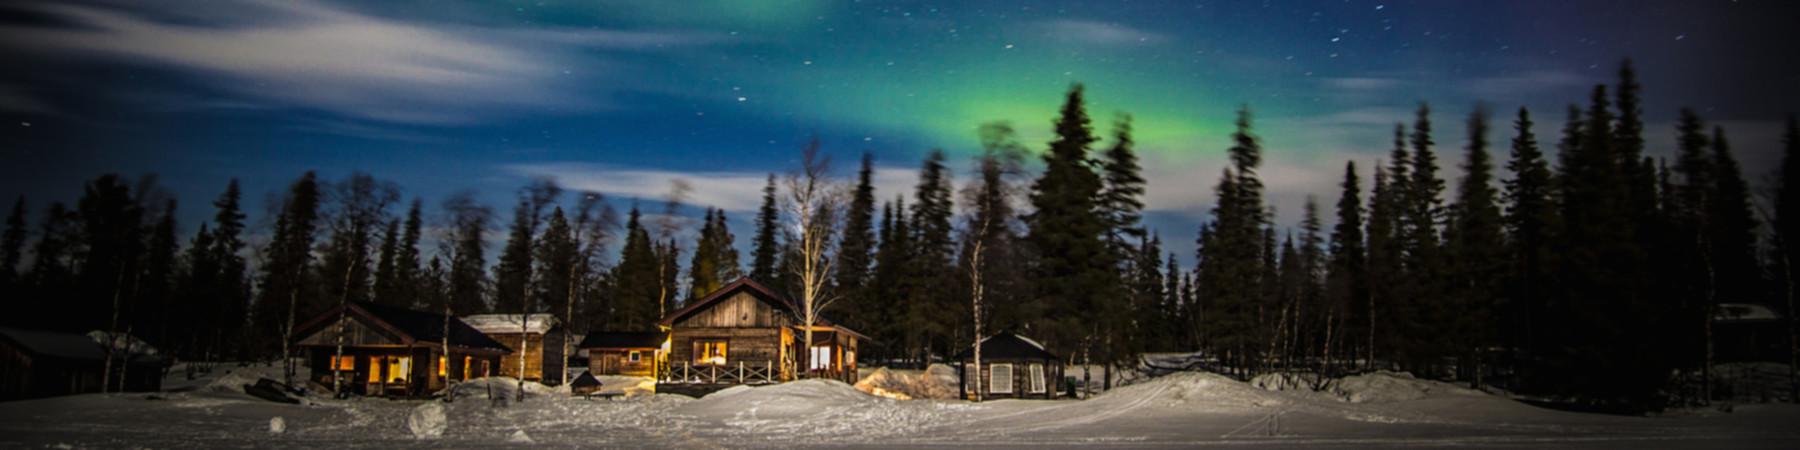 Kiruna_Banner.jpg